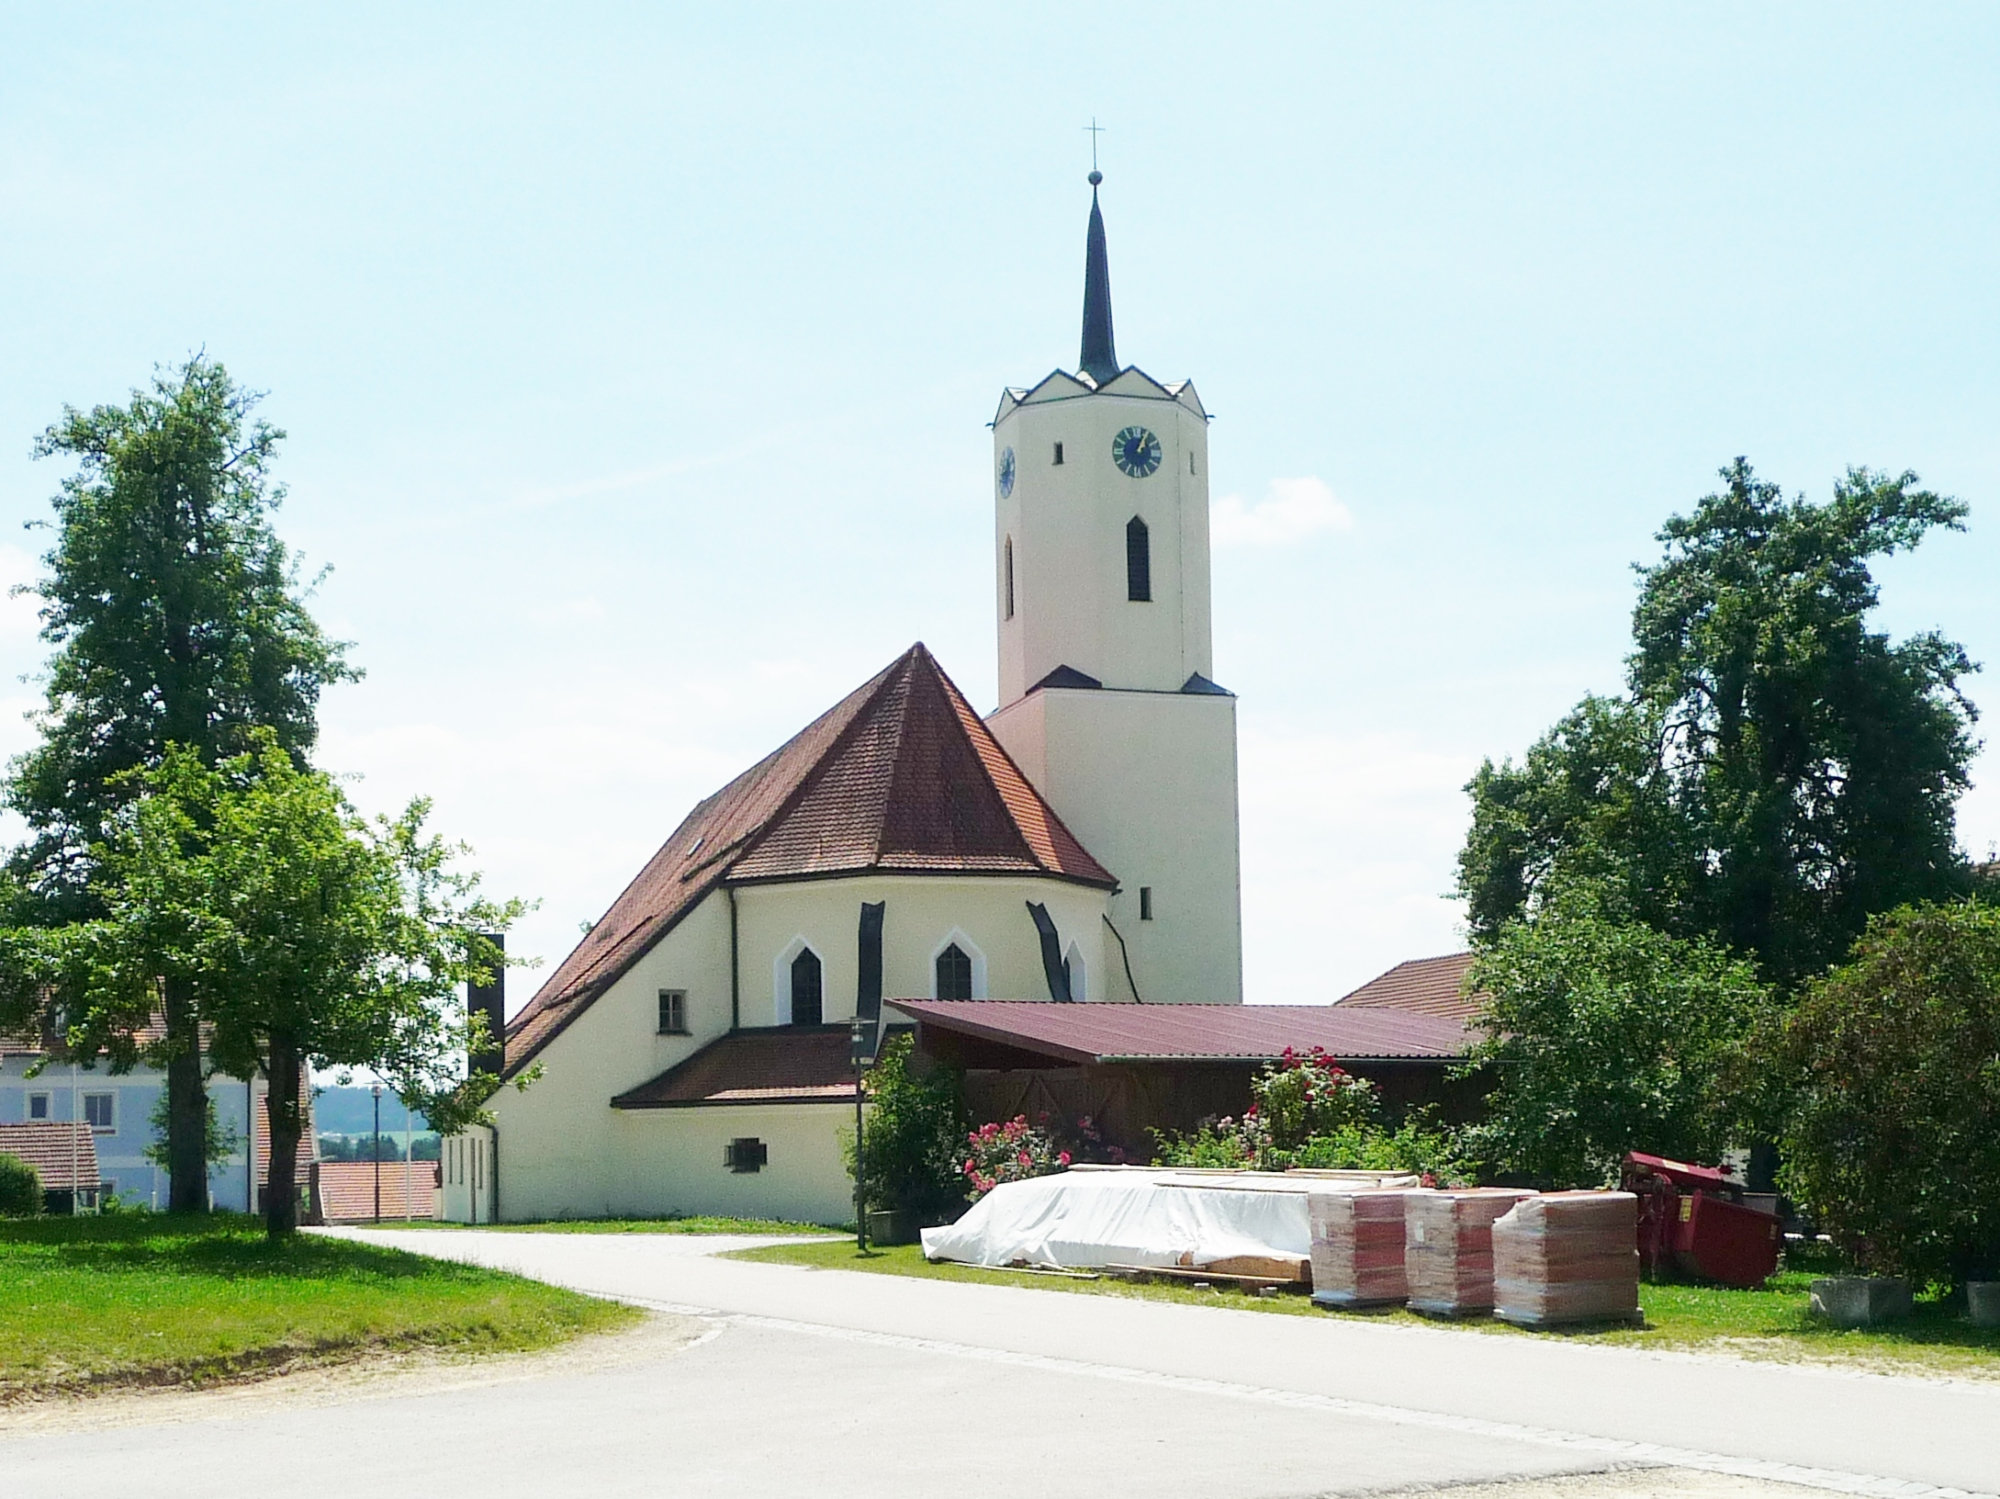 Pfarrkirche St Nikolaus Haag